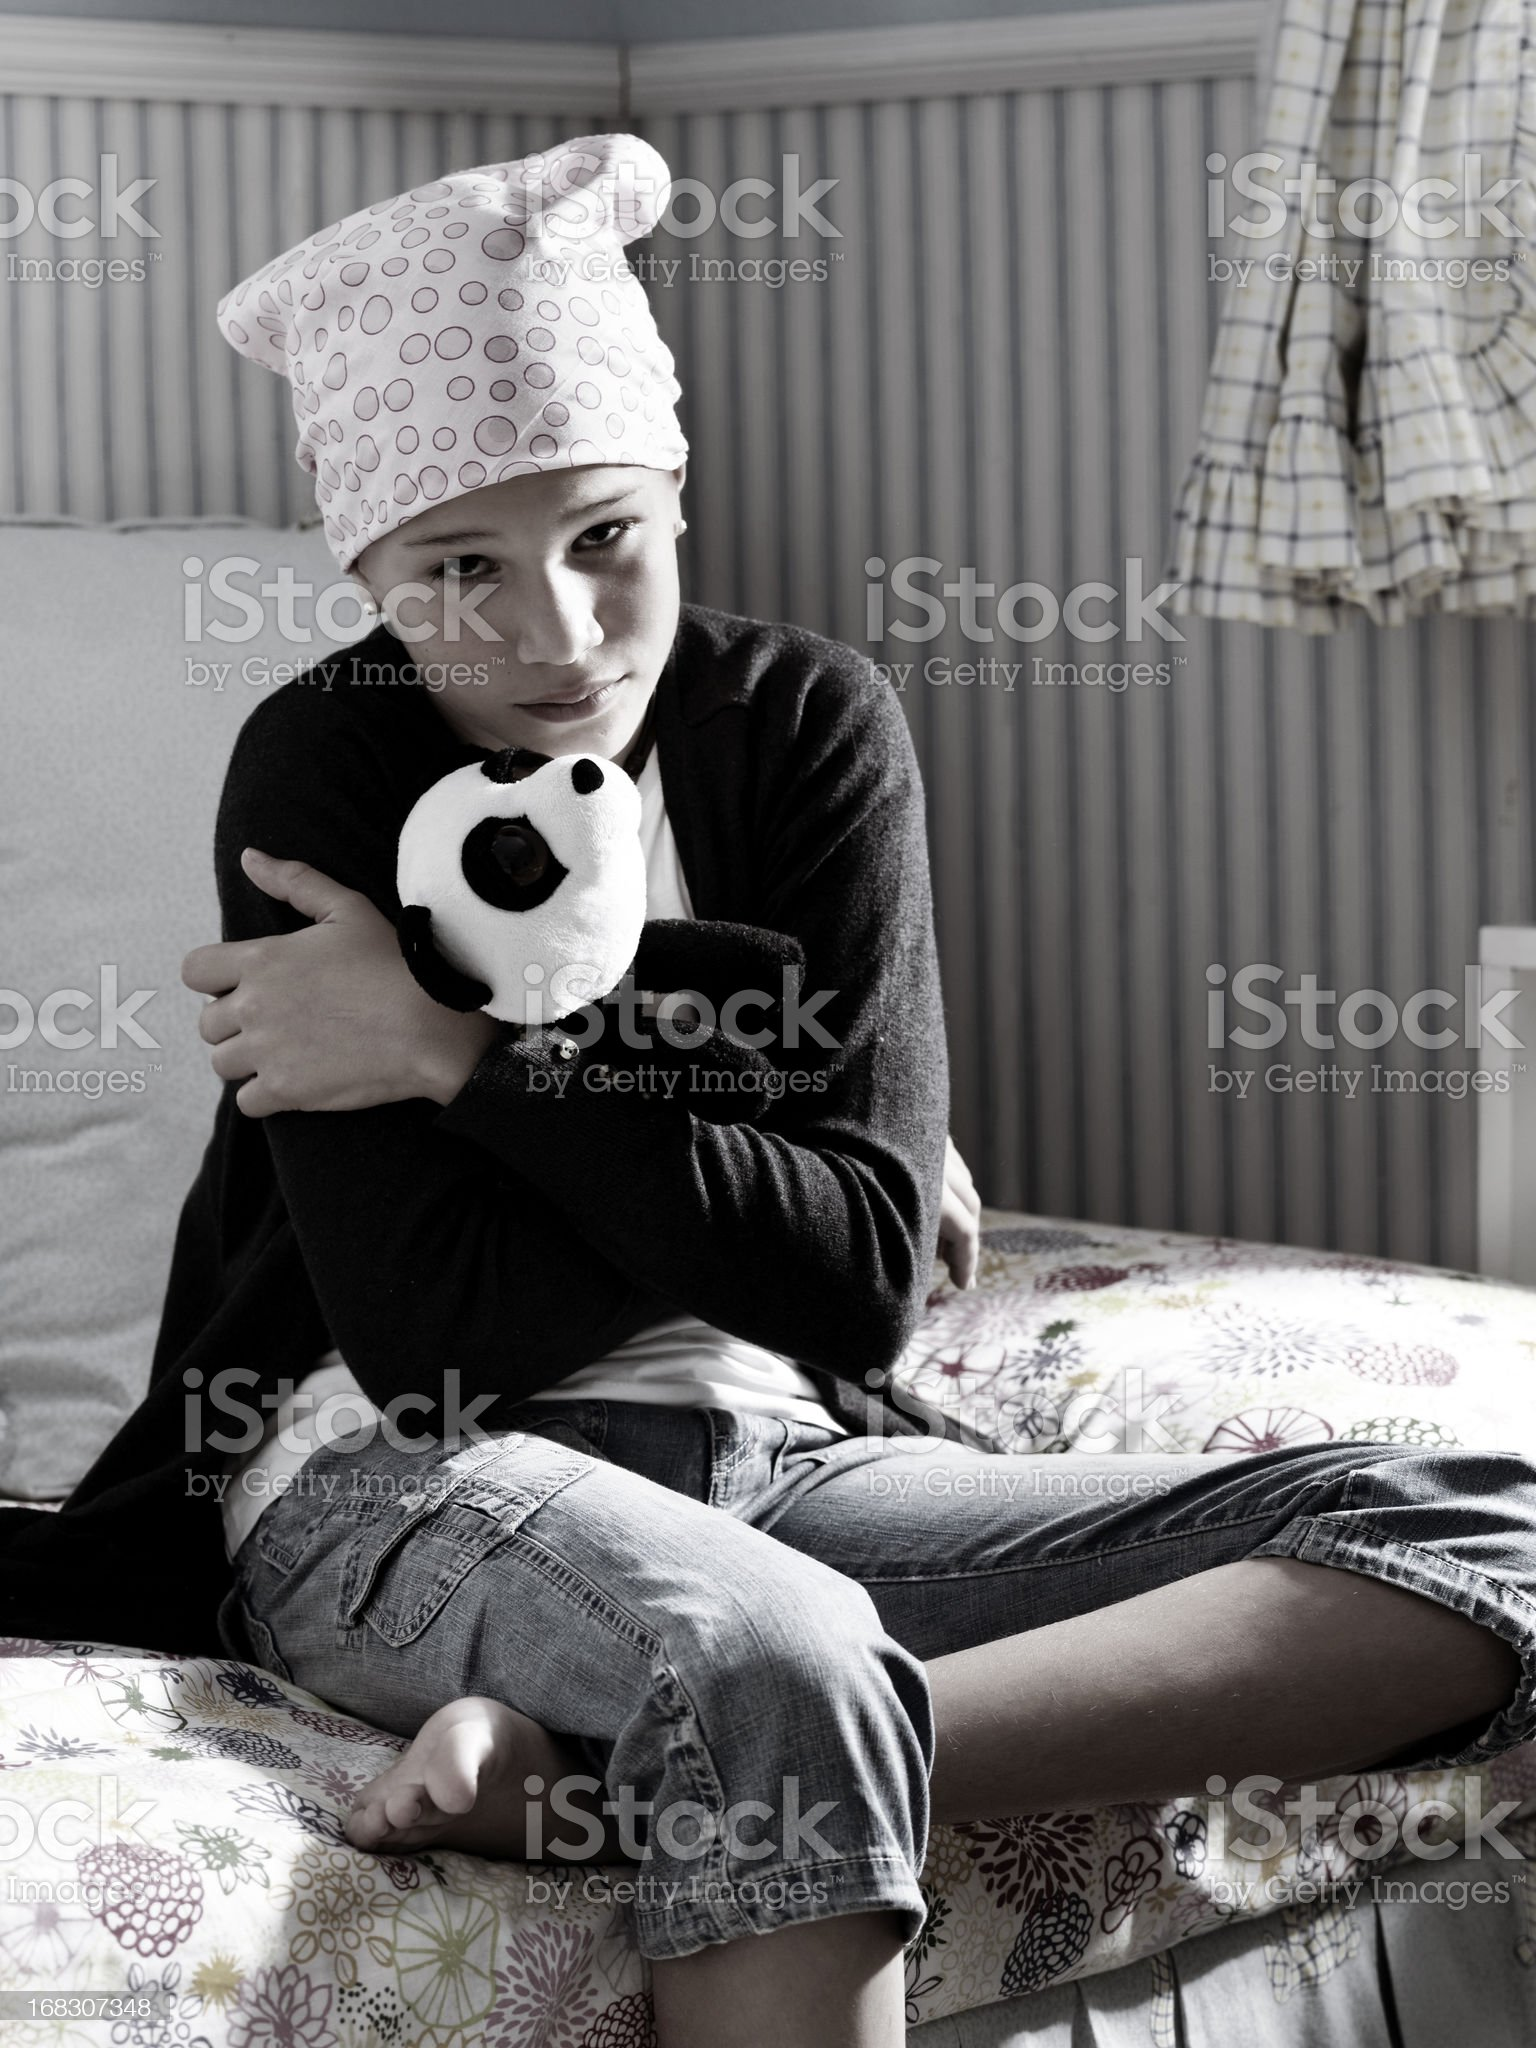 Sick girl royalty-free stock photo